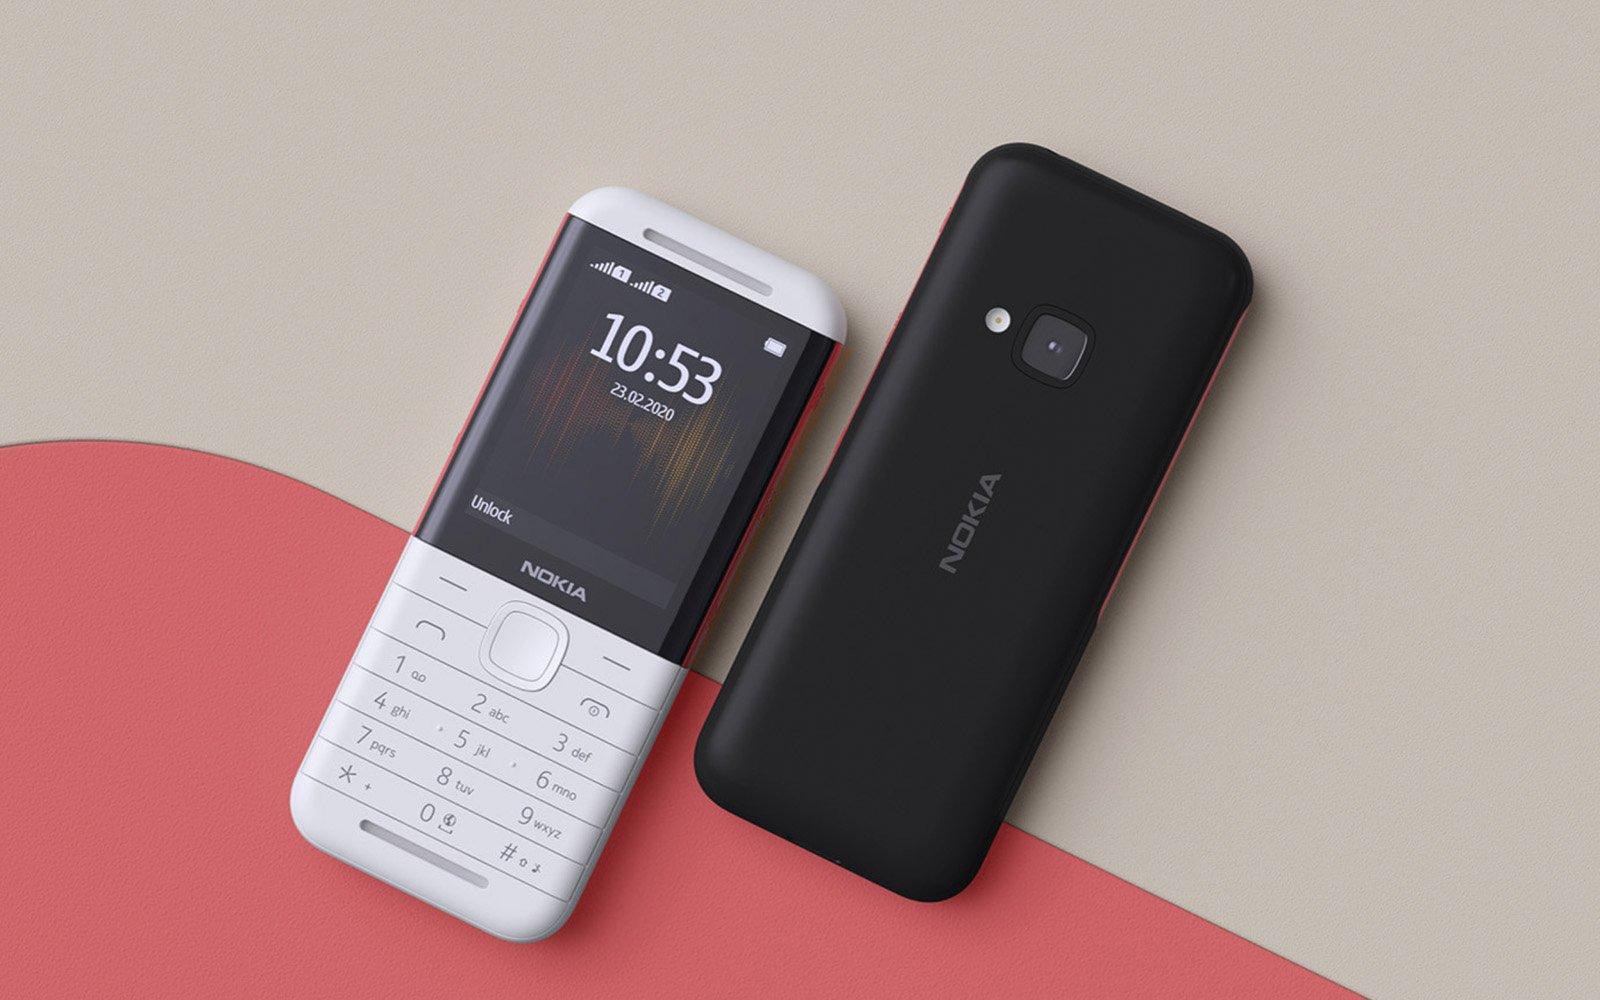 Внешний вид нового Nokia 5310